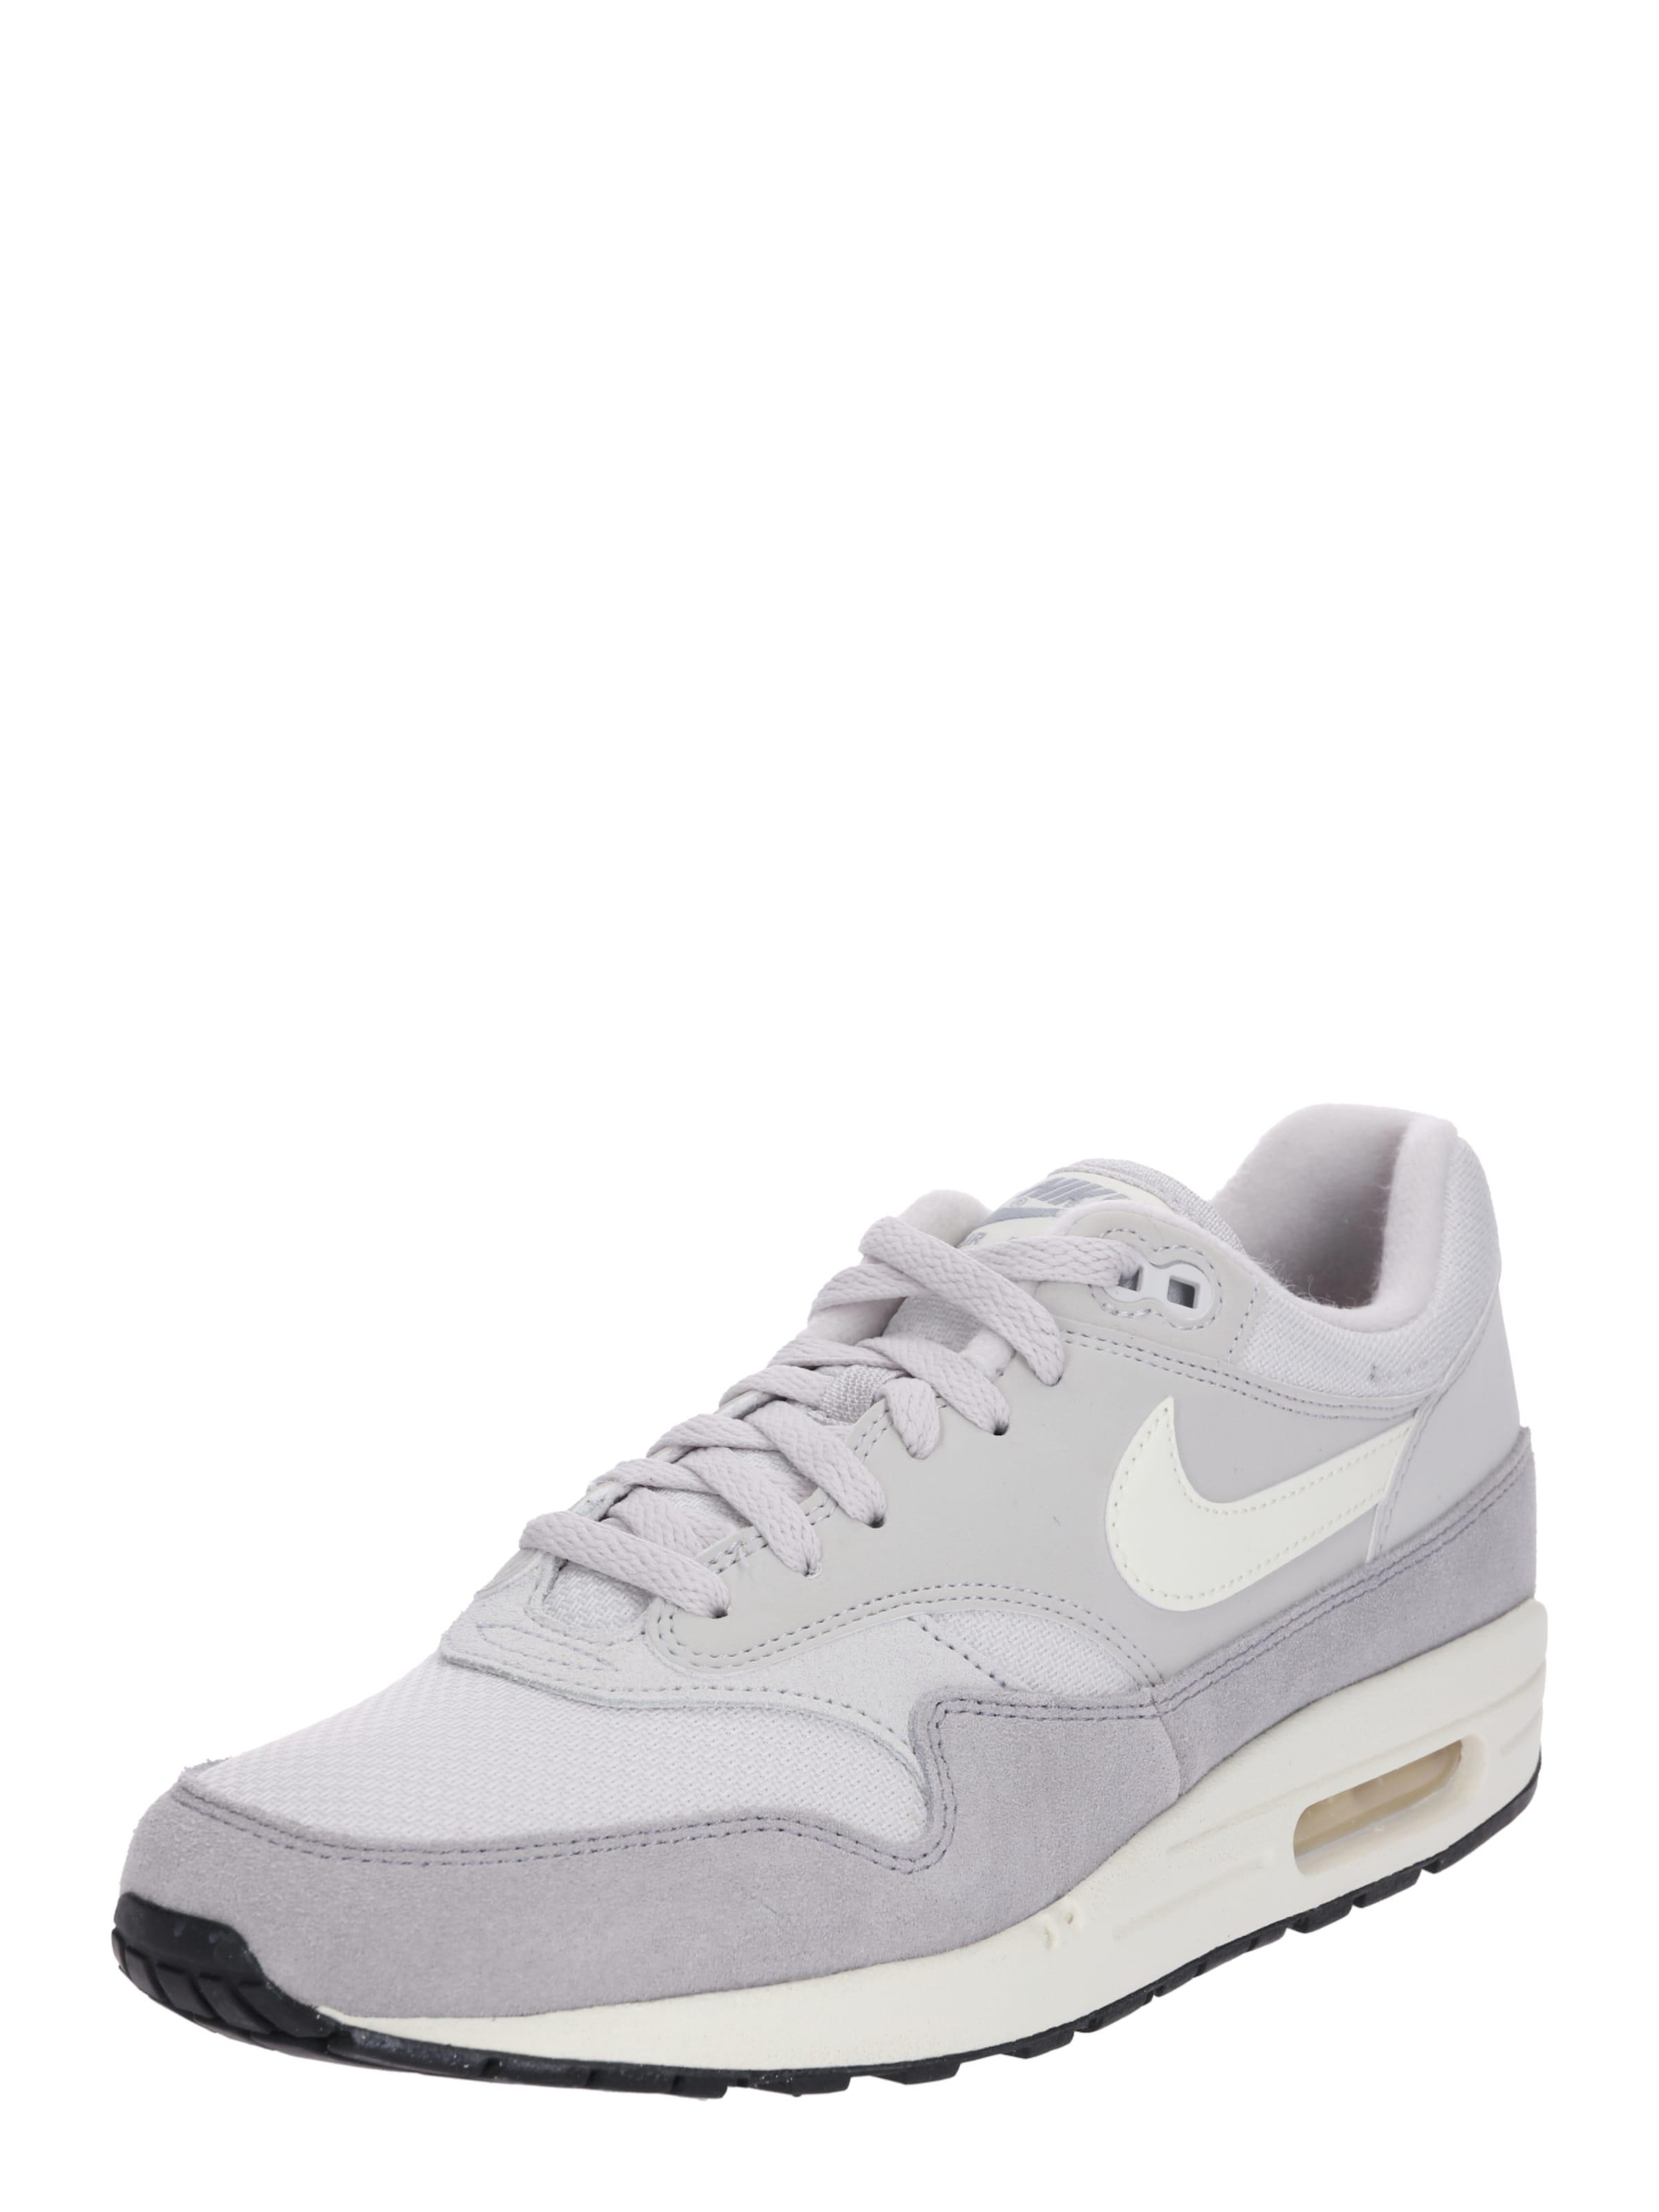 'air Nike Sportswear Basses 1' GrisNoir Blanc Baskets Max En WBoeCxrd